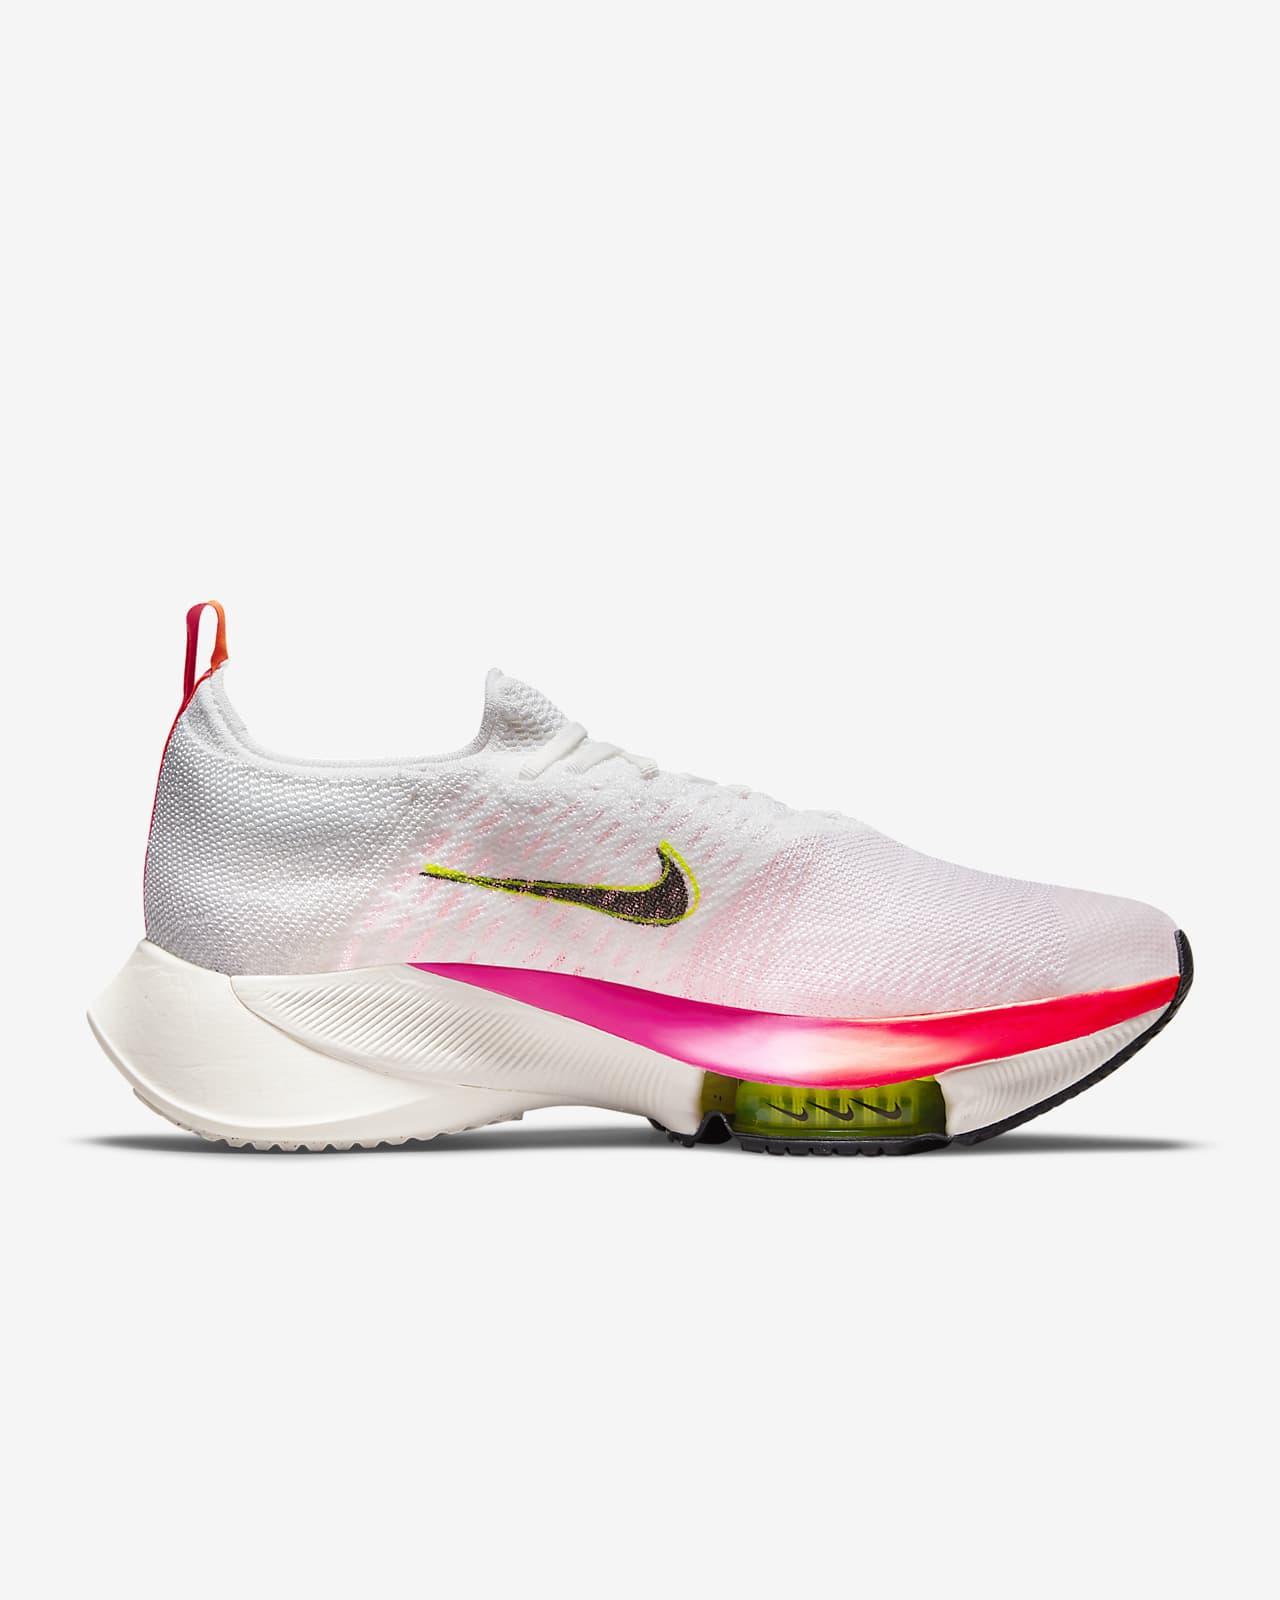 Chaussure de running sur route Nike Air Zoom Tempo NEXT% Flyknit pour Homme